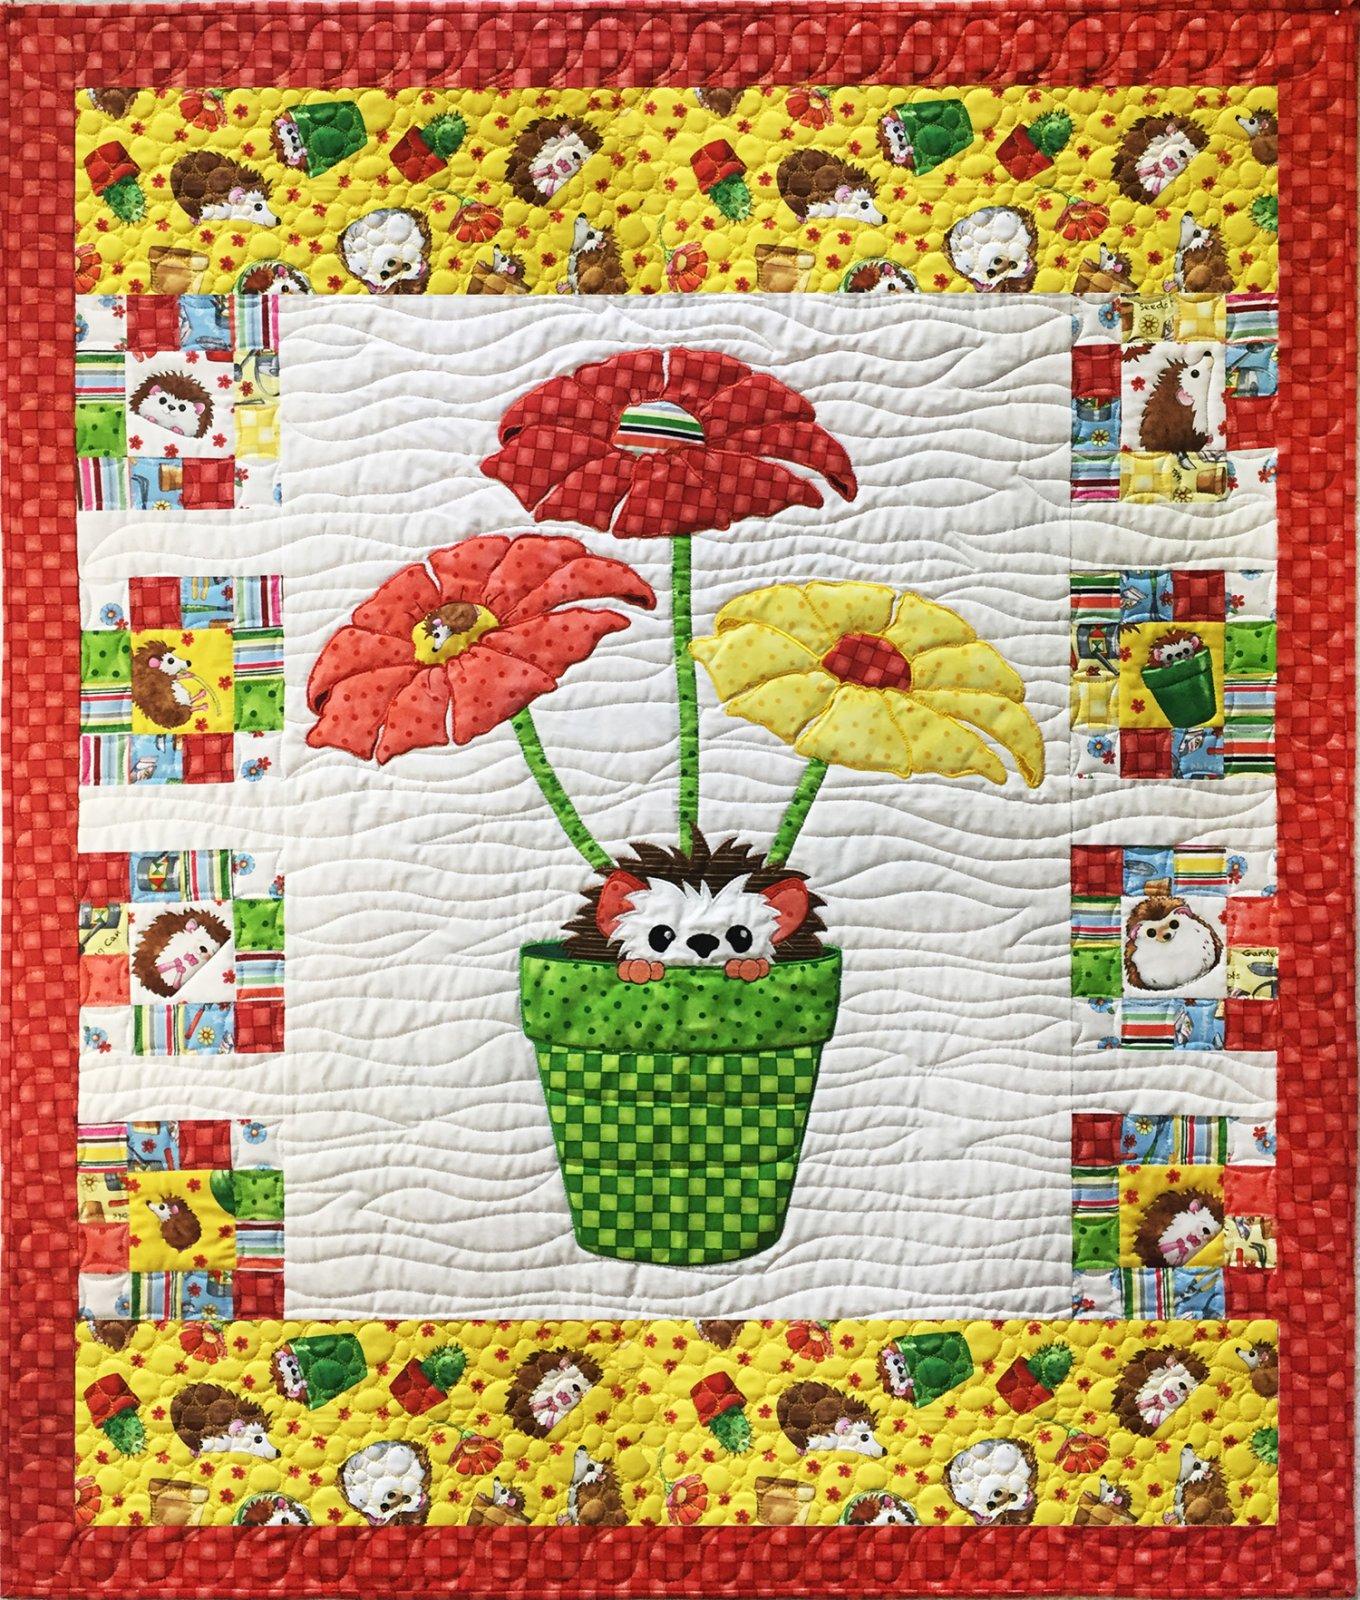 Blooming Hedgehog Applique Quilt Pattern (BQ-14) - 700381585430